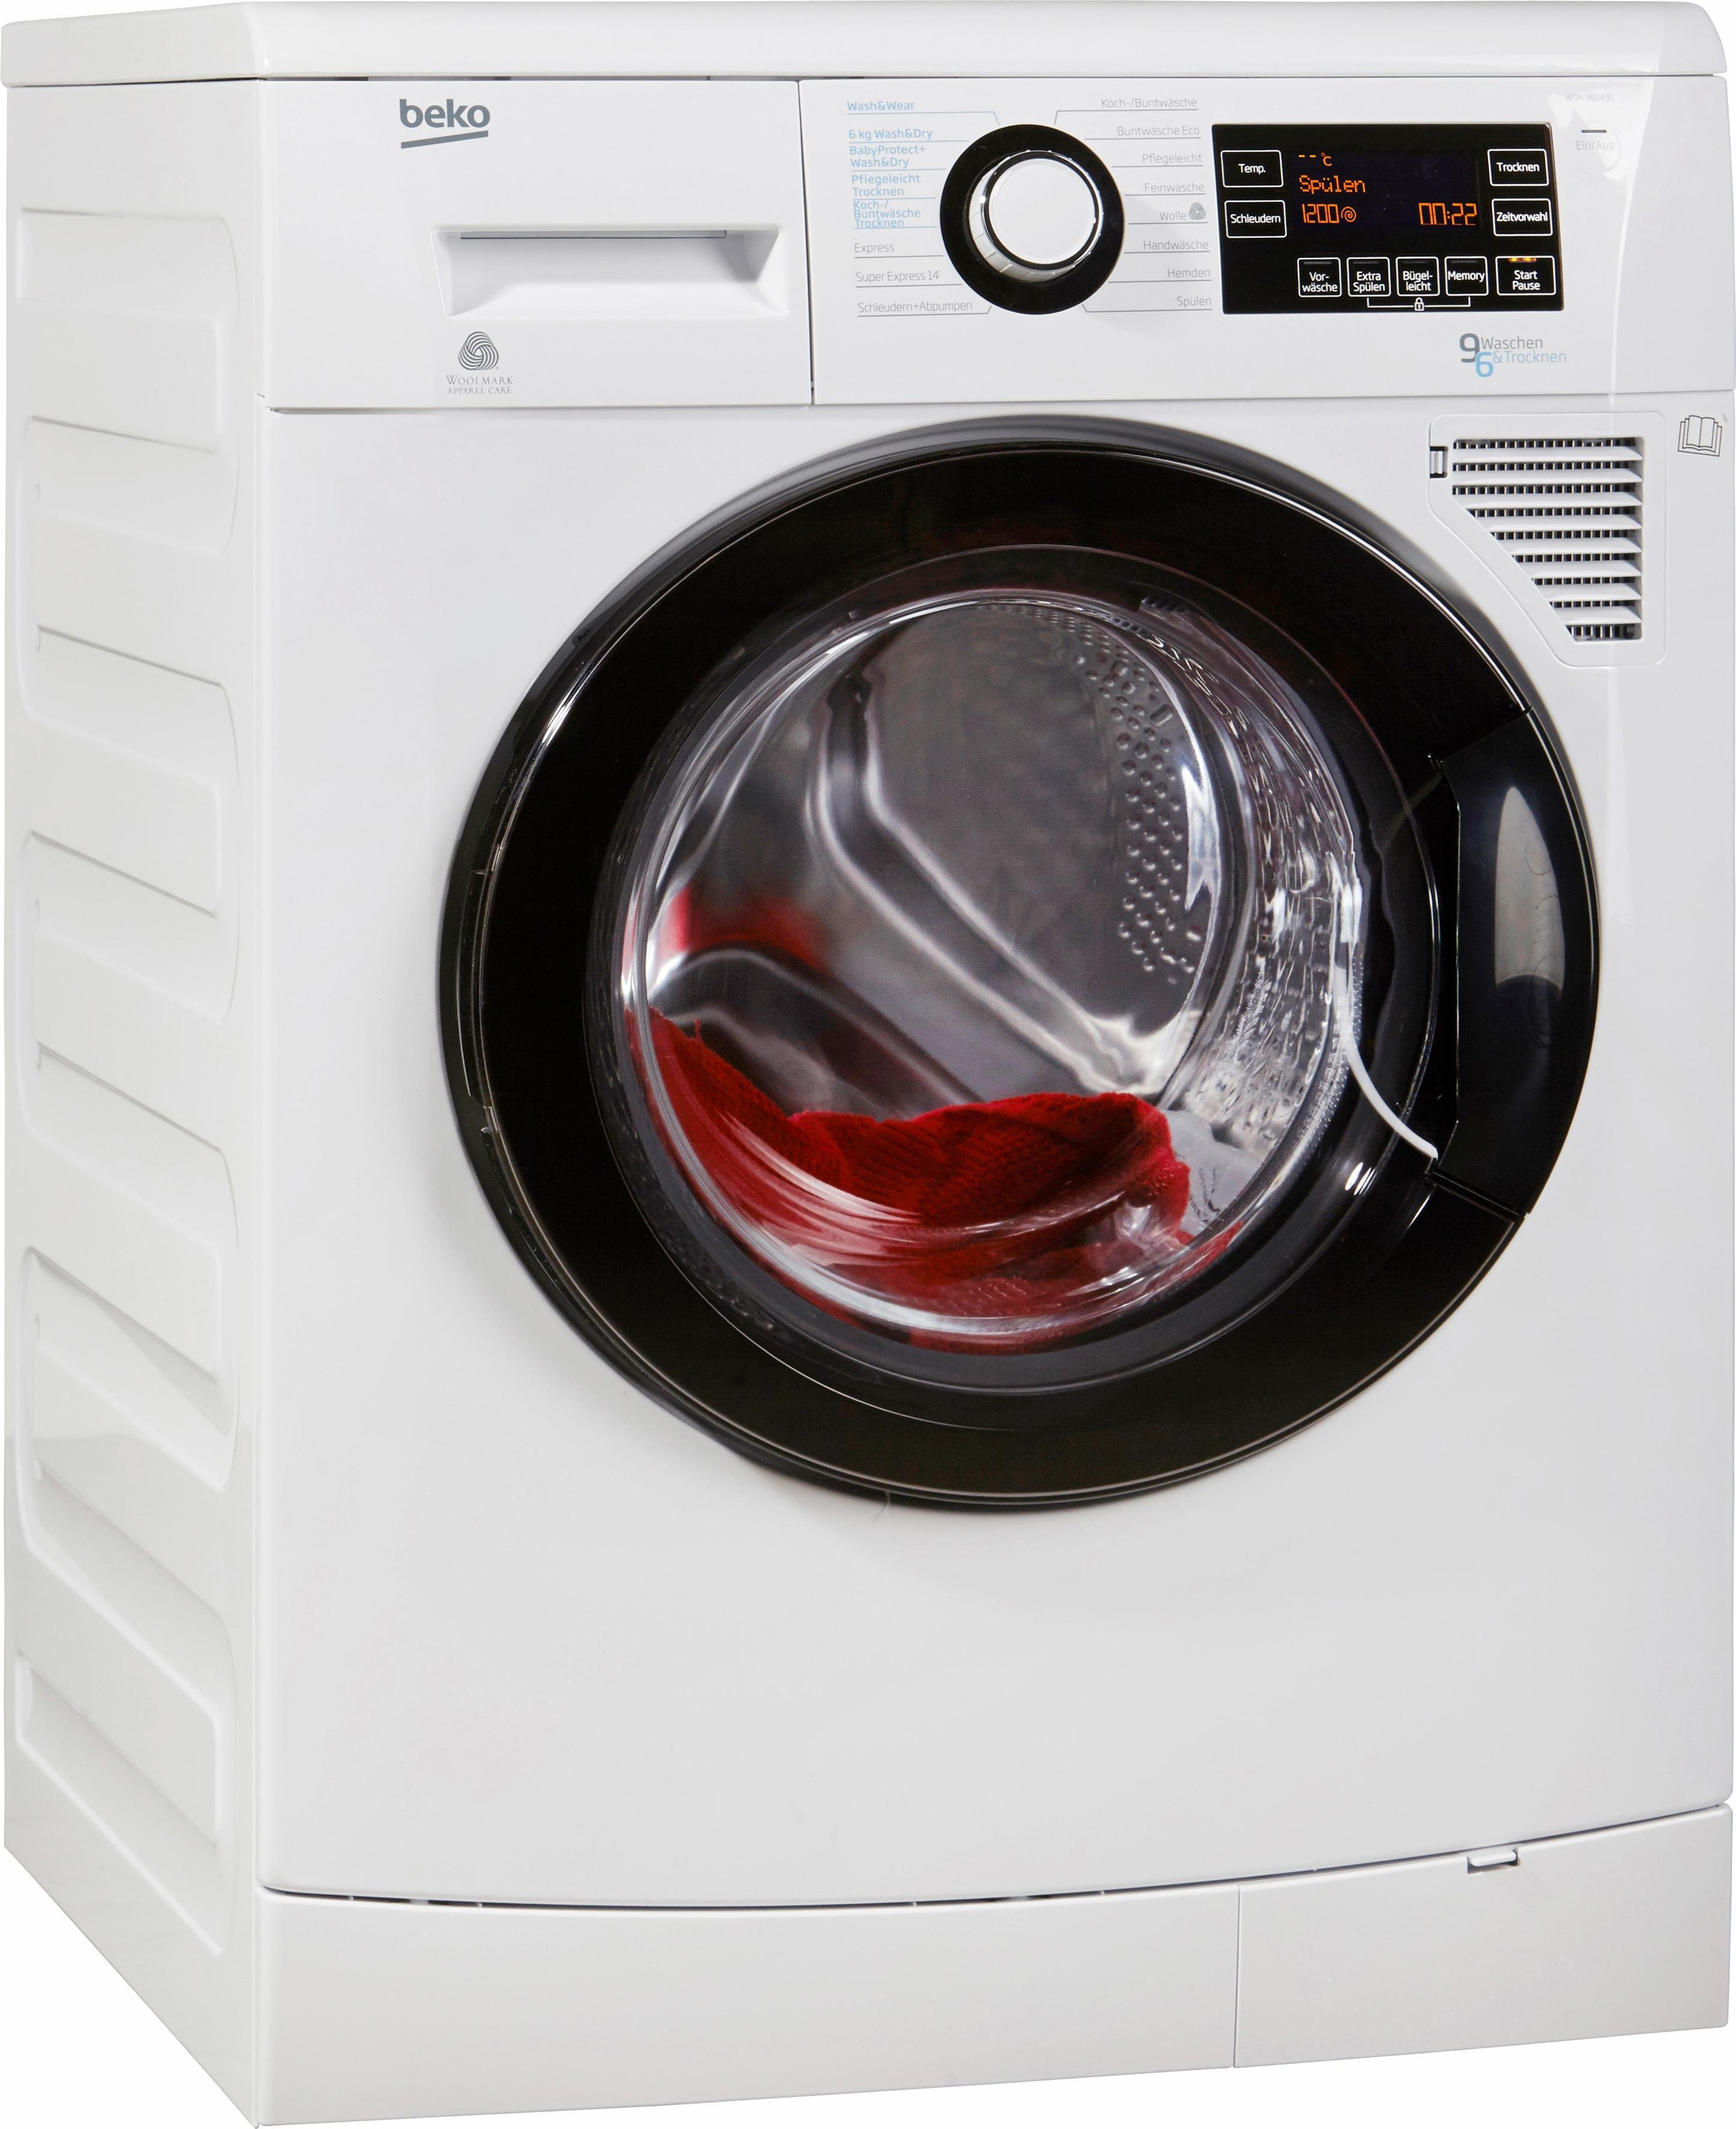 BEKO Waschtrockner WDA 961431, 9 kg/6 kg, 1400 U/Min